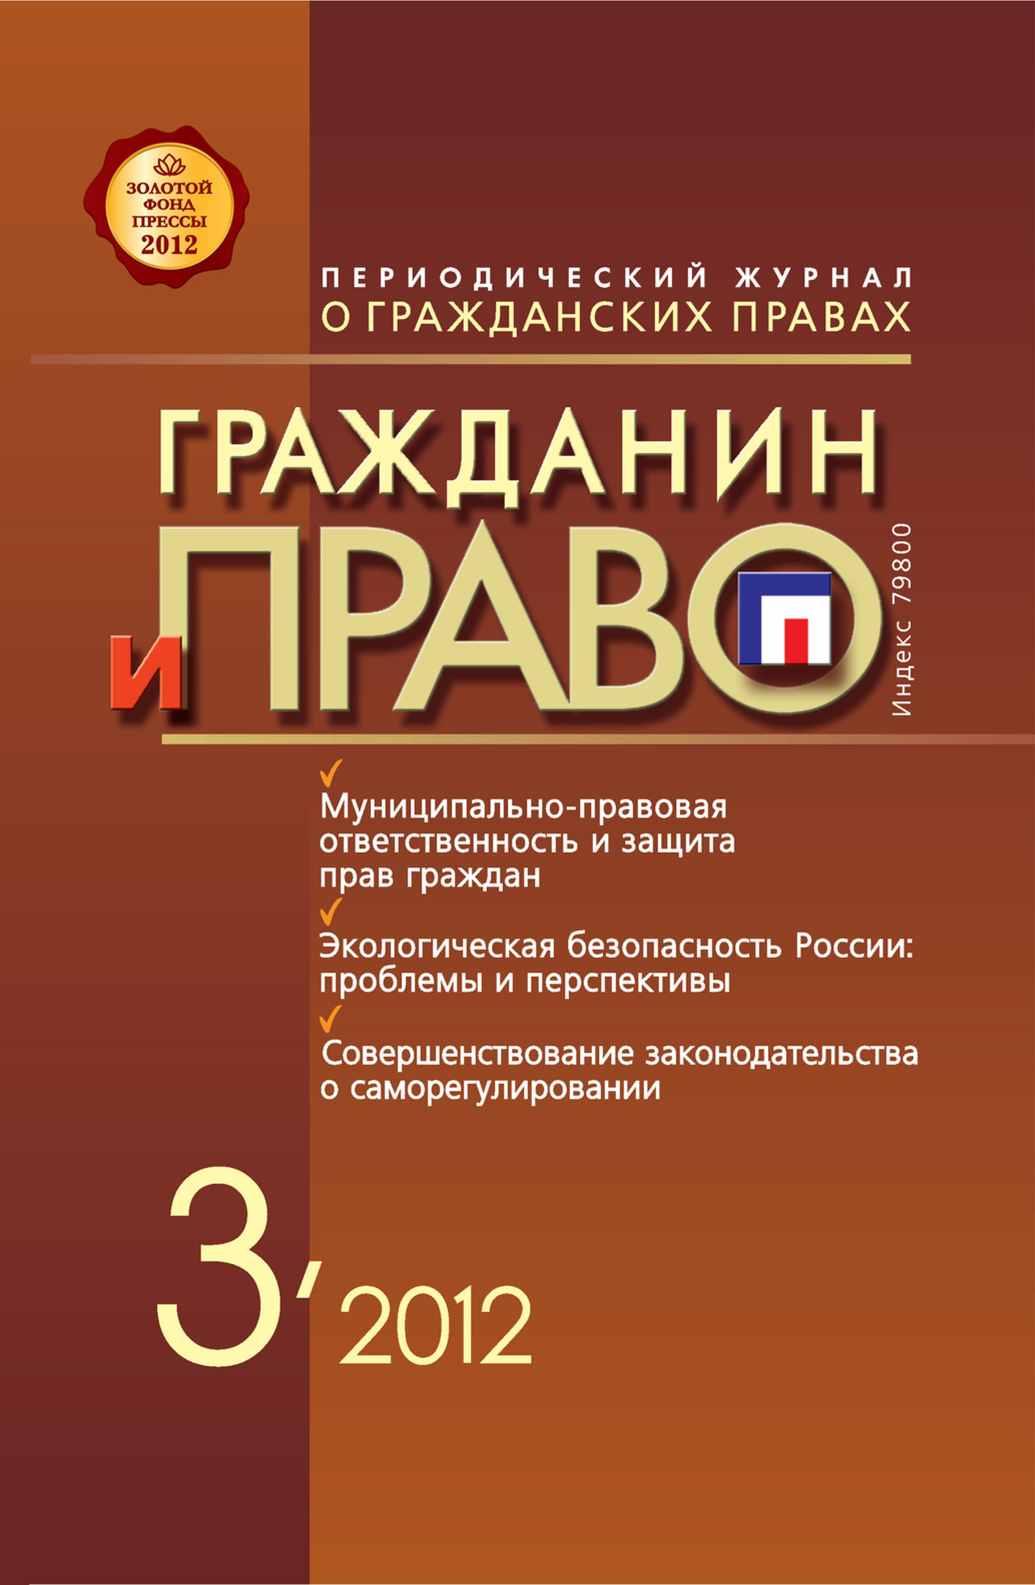 Гражданин и право №03/2012